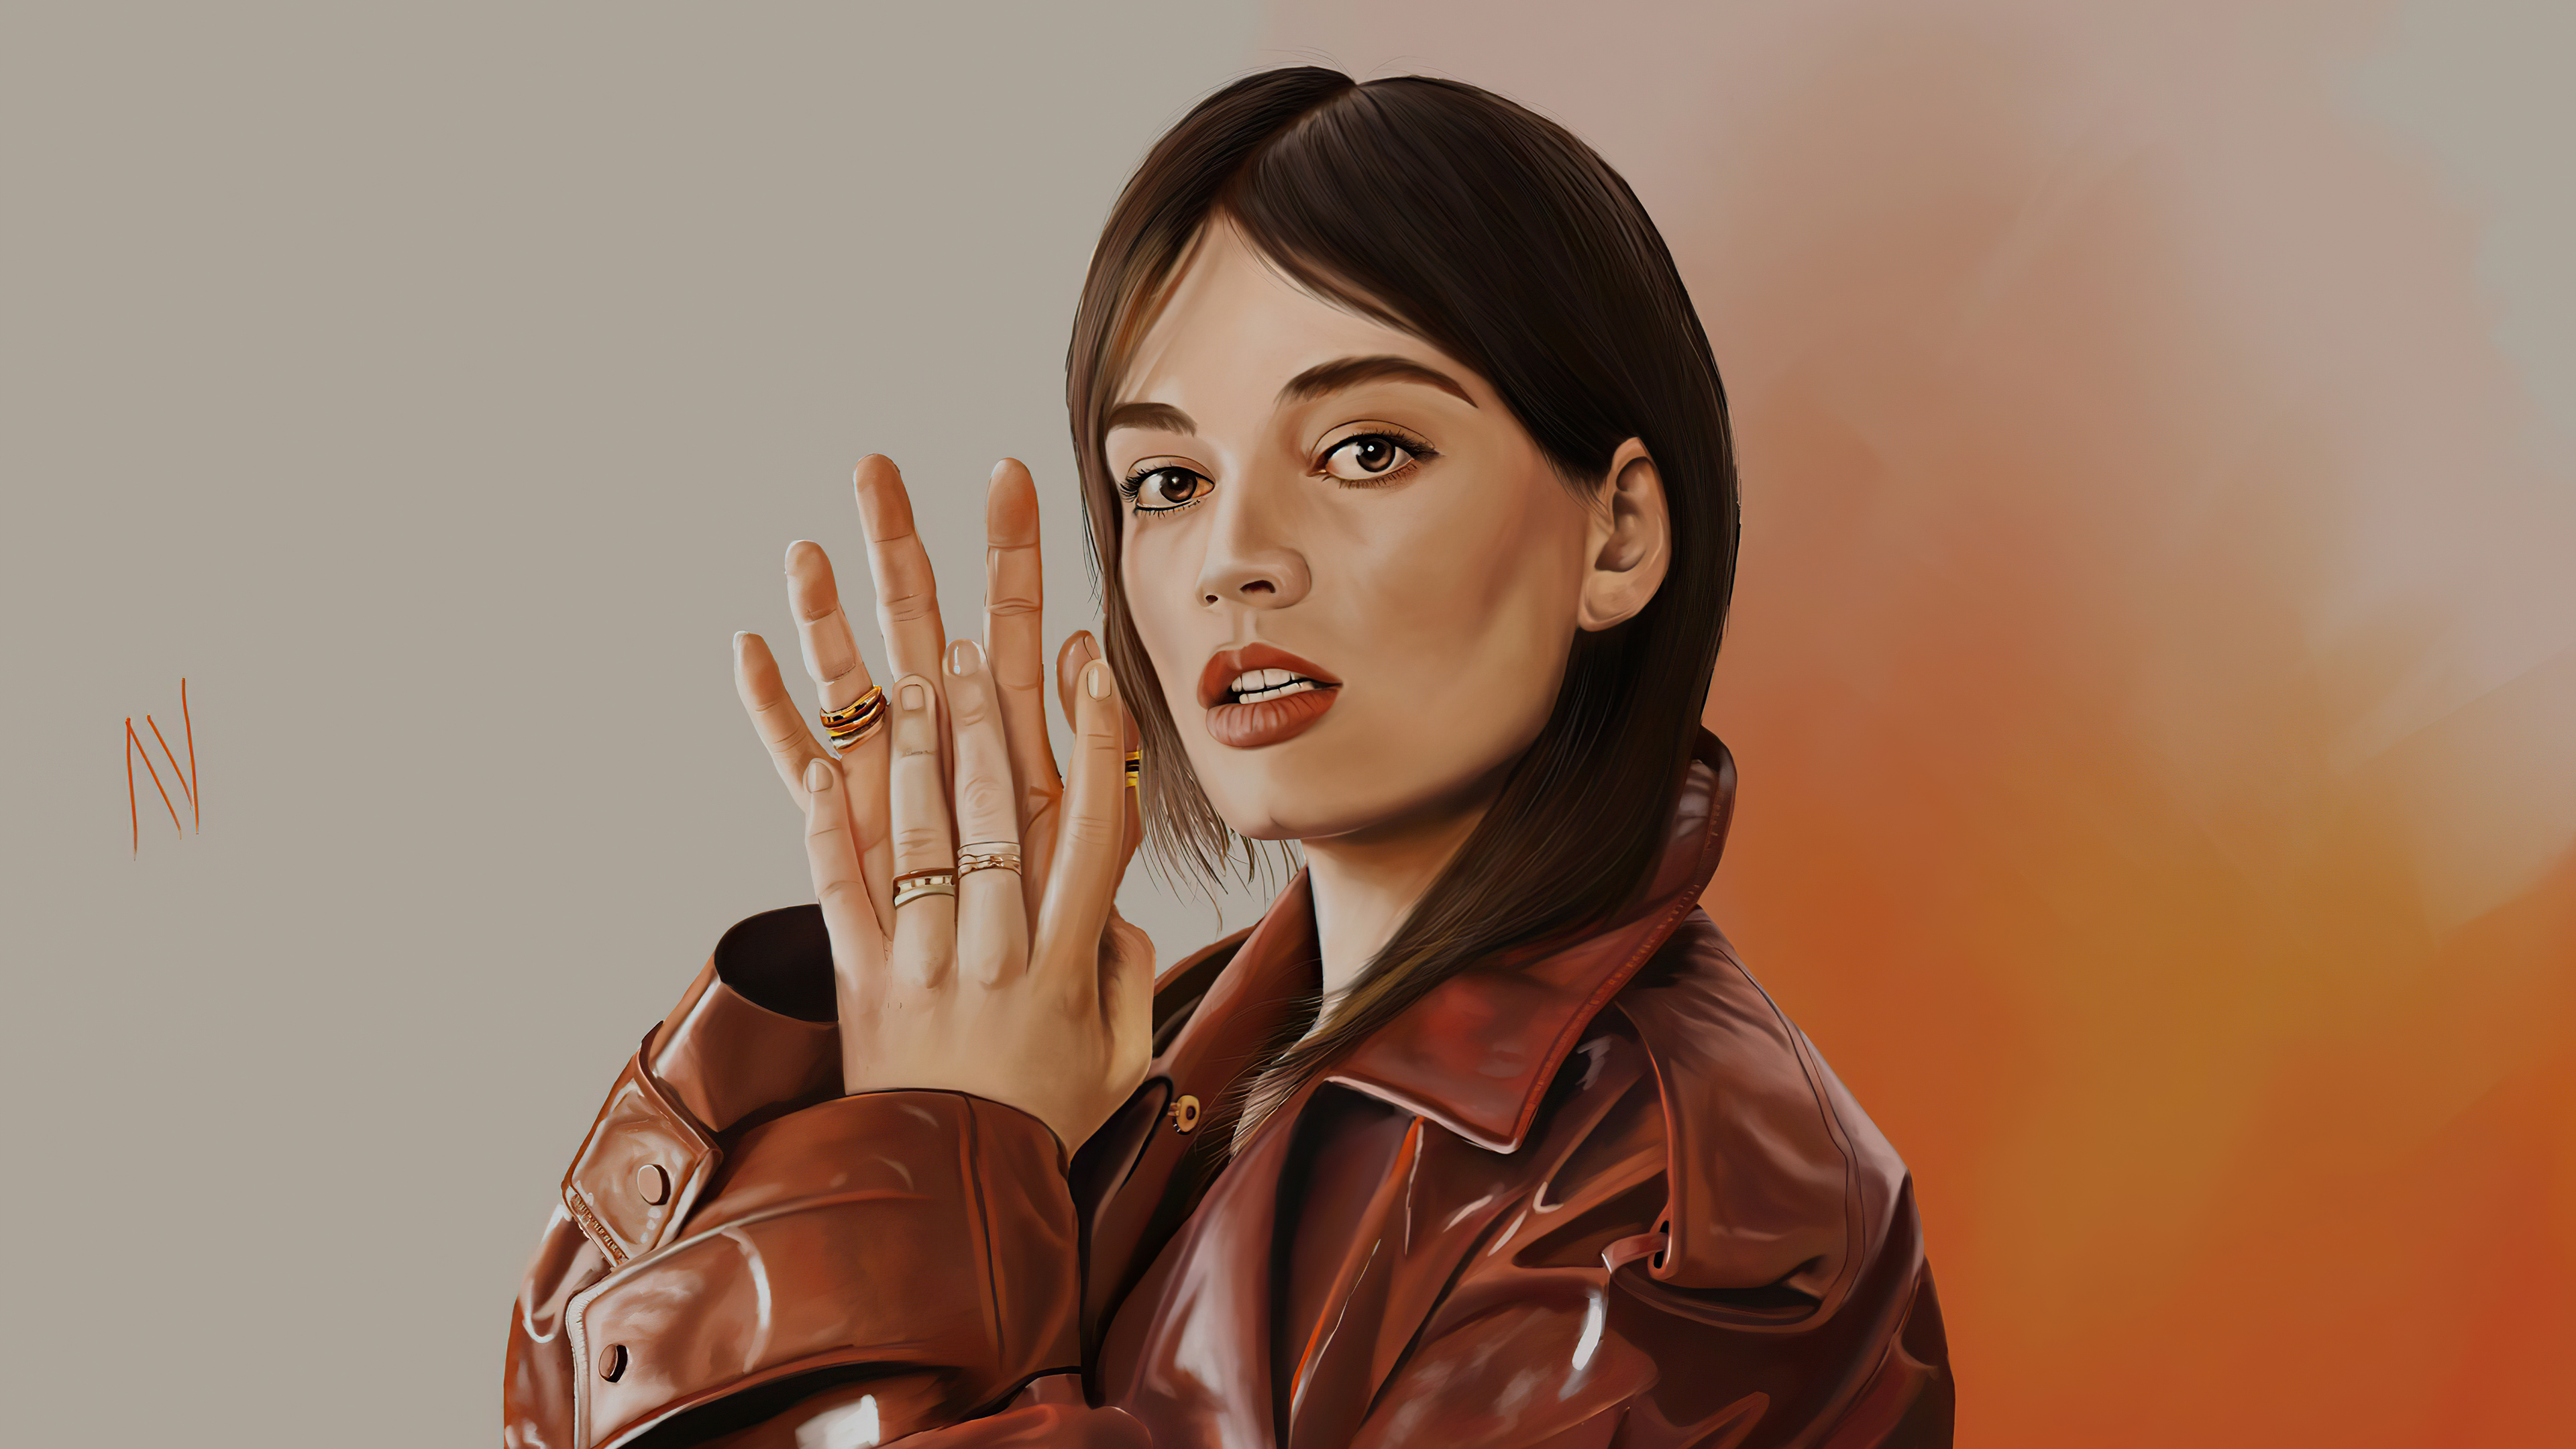 emma mackey paint art 4k 1608623858 - Emma Mackey Paint Art 4k - Emma Mackey Paint Art 4k wallpapers